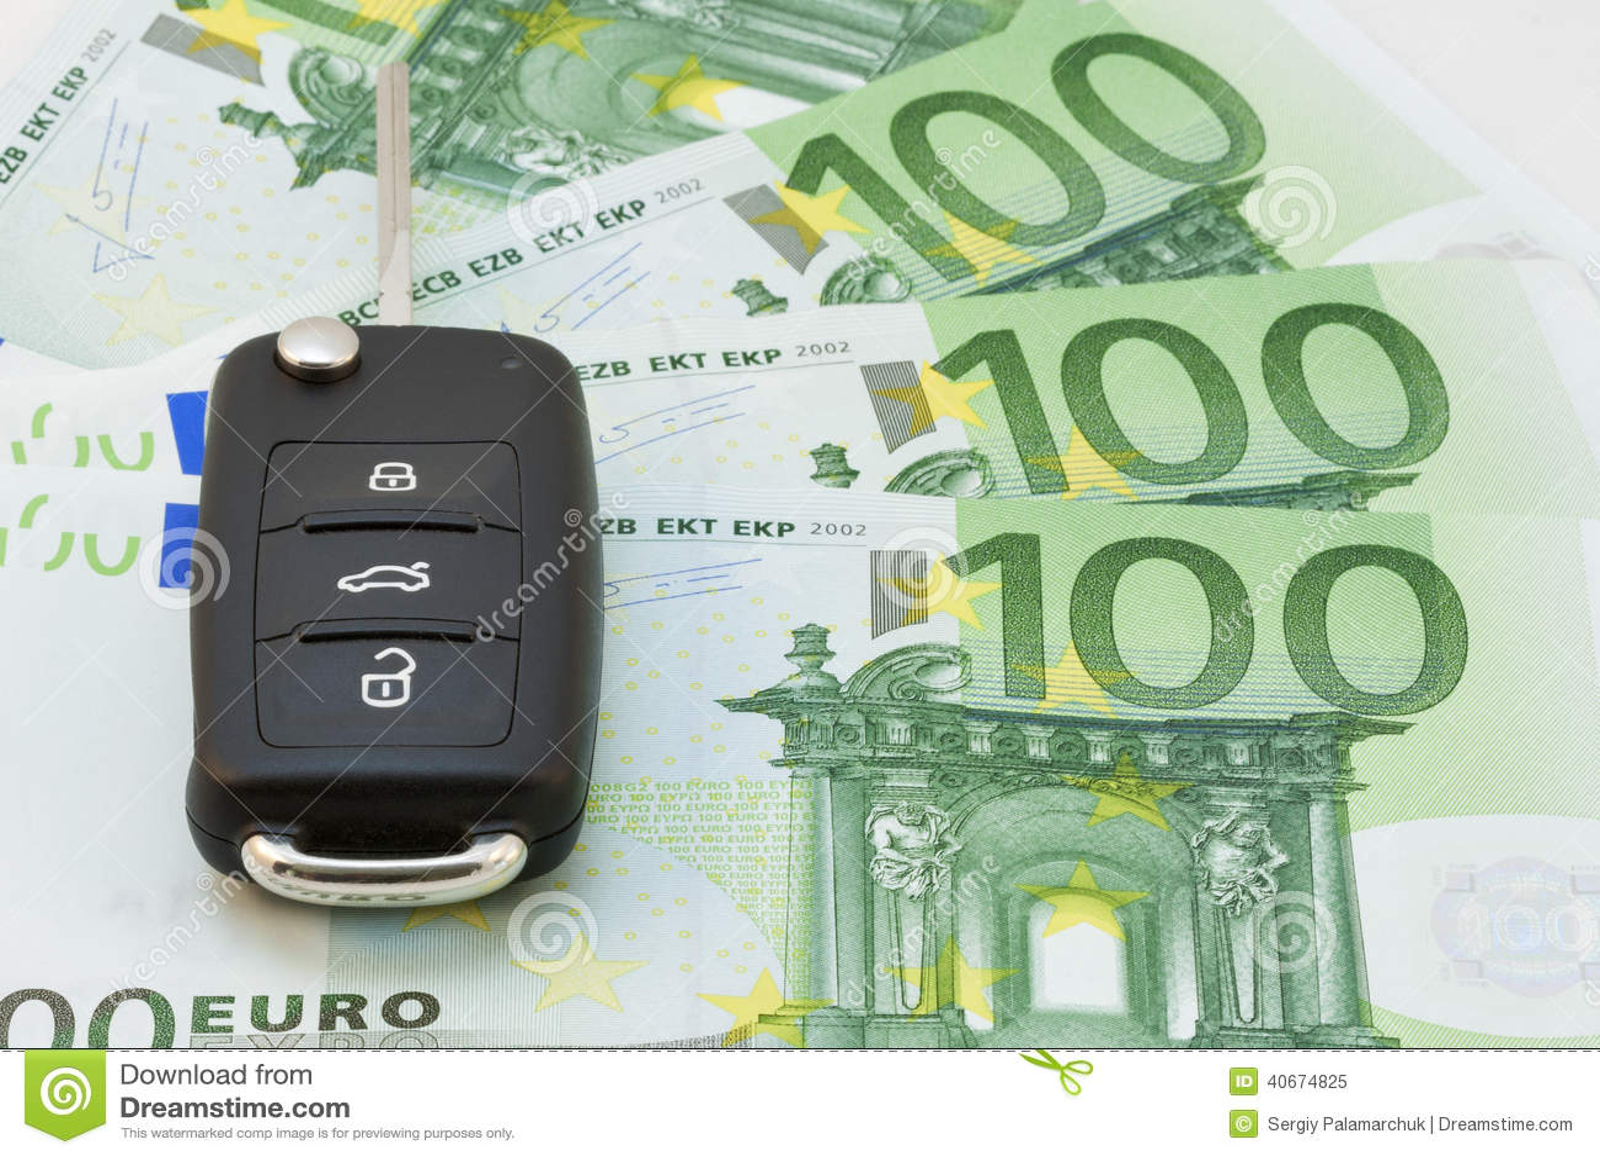 Car Keys Over Euro Banknotes Stock Image Image Of Luxury Euro